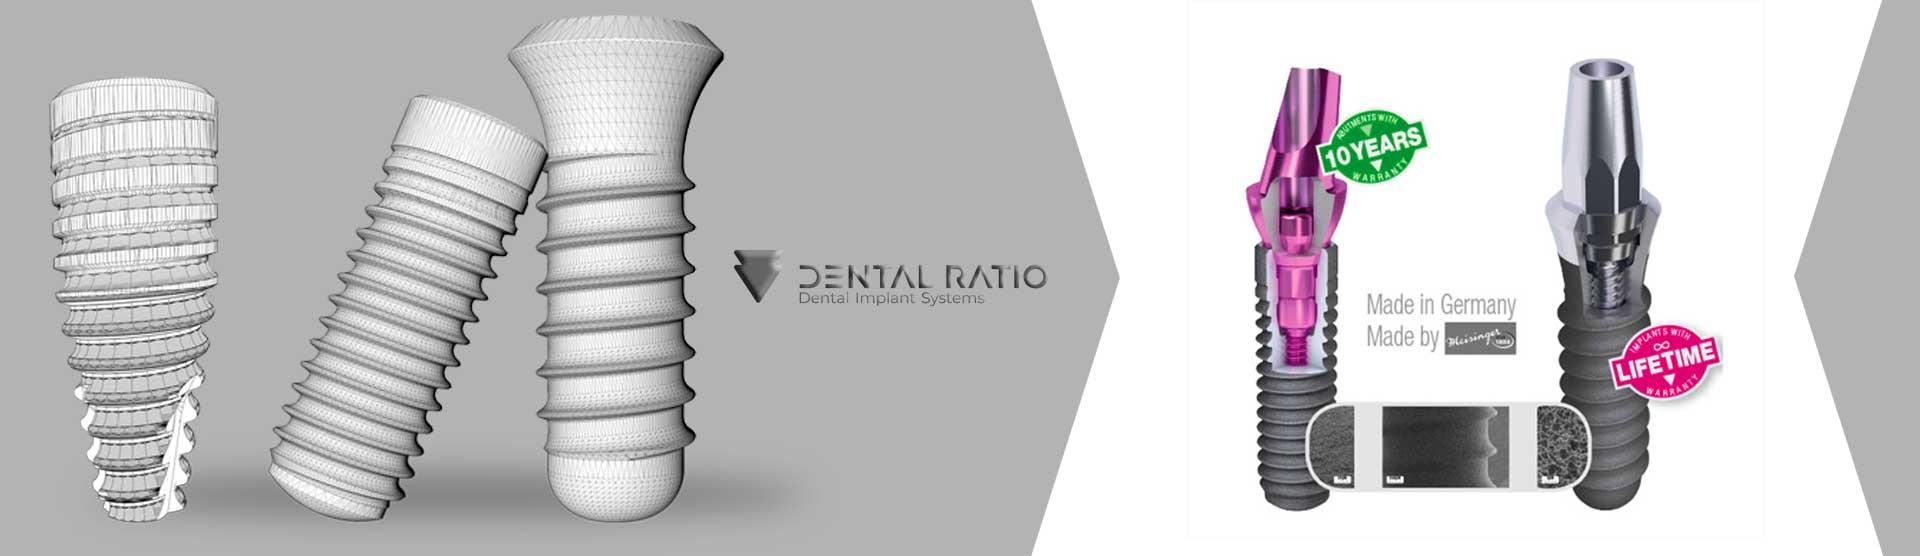 DENTAL RATIO, a cég, amiben hihet!